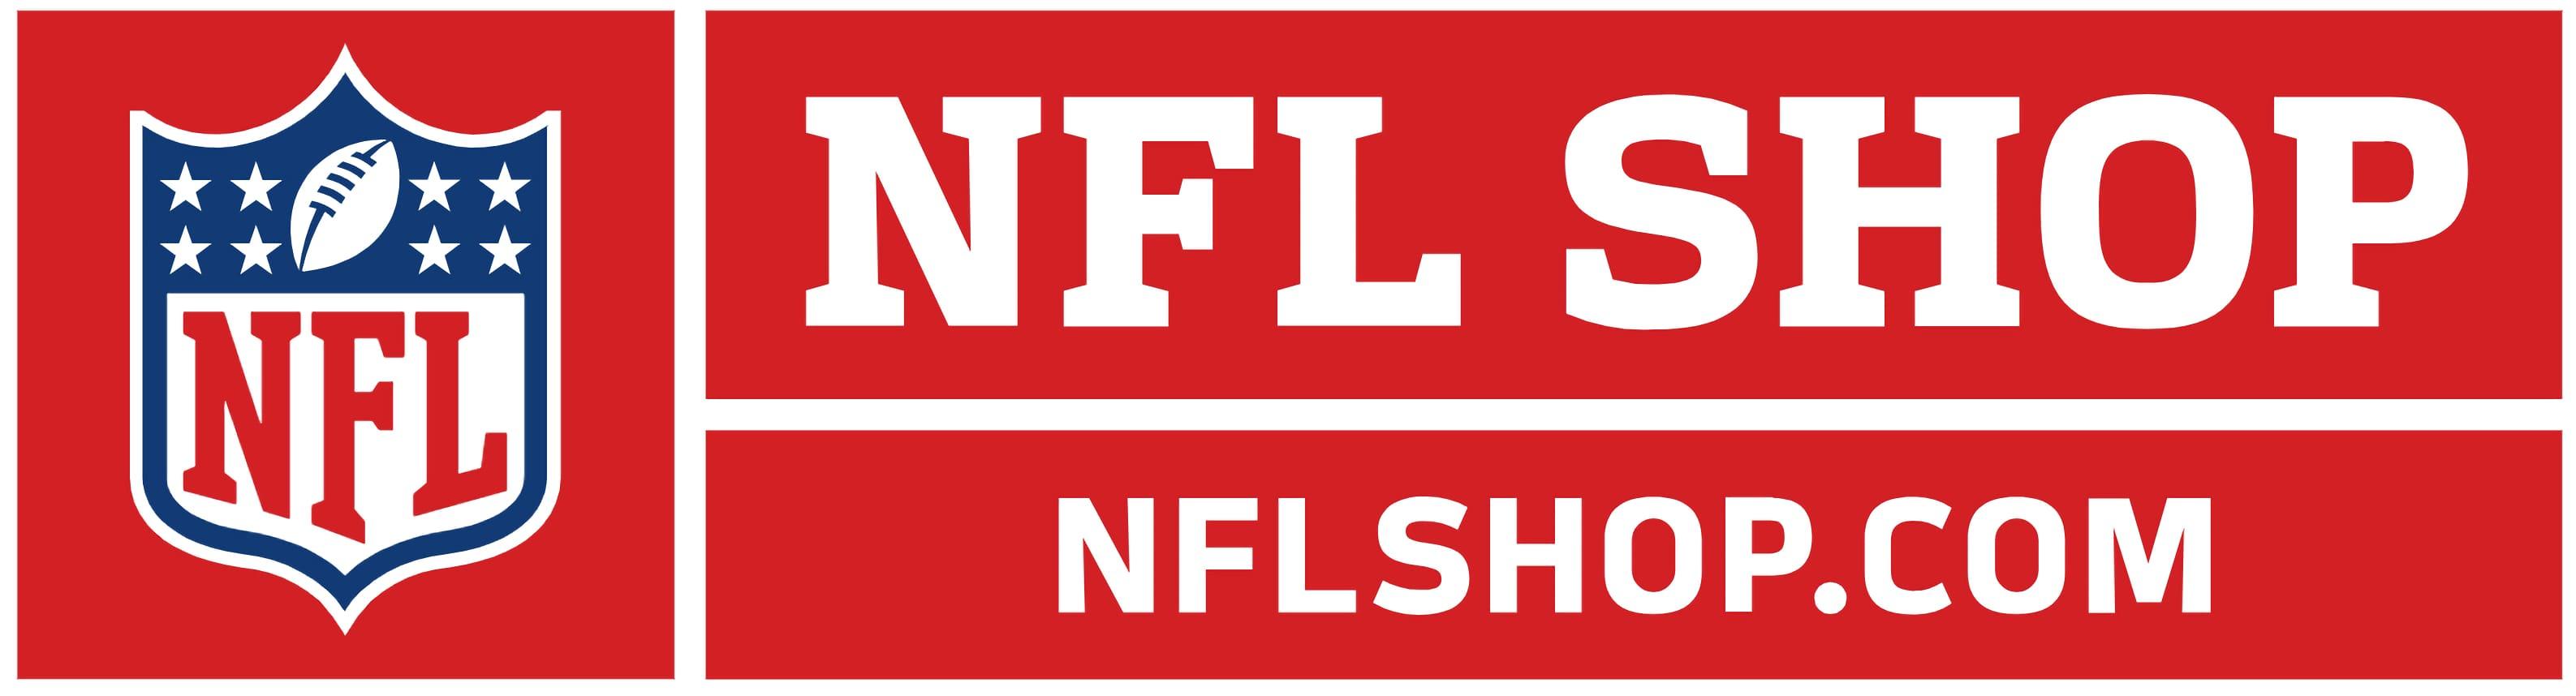 NFL Shop Clearance Sale